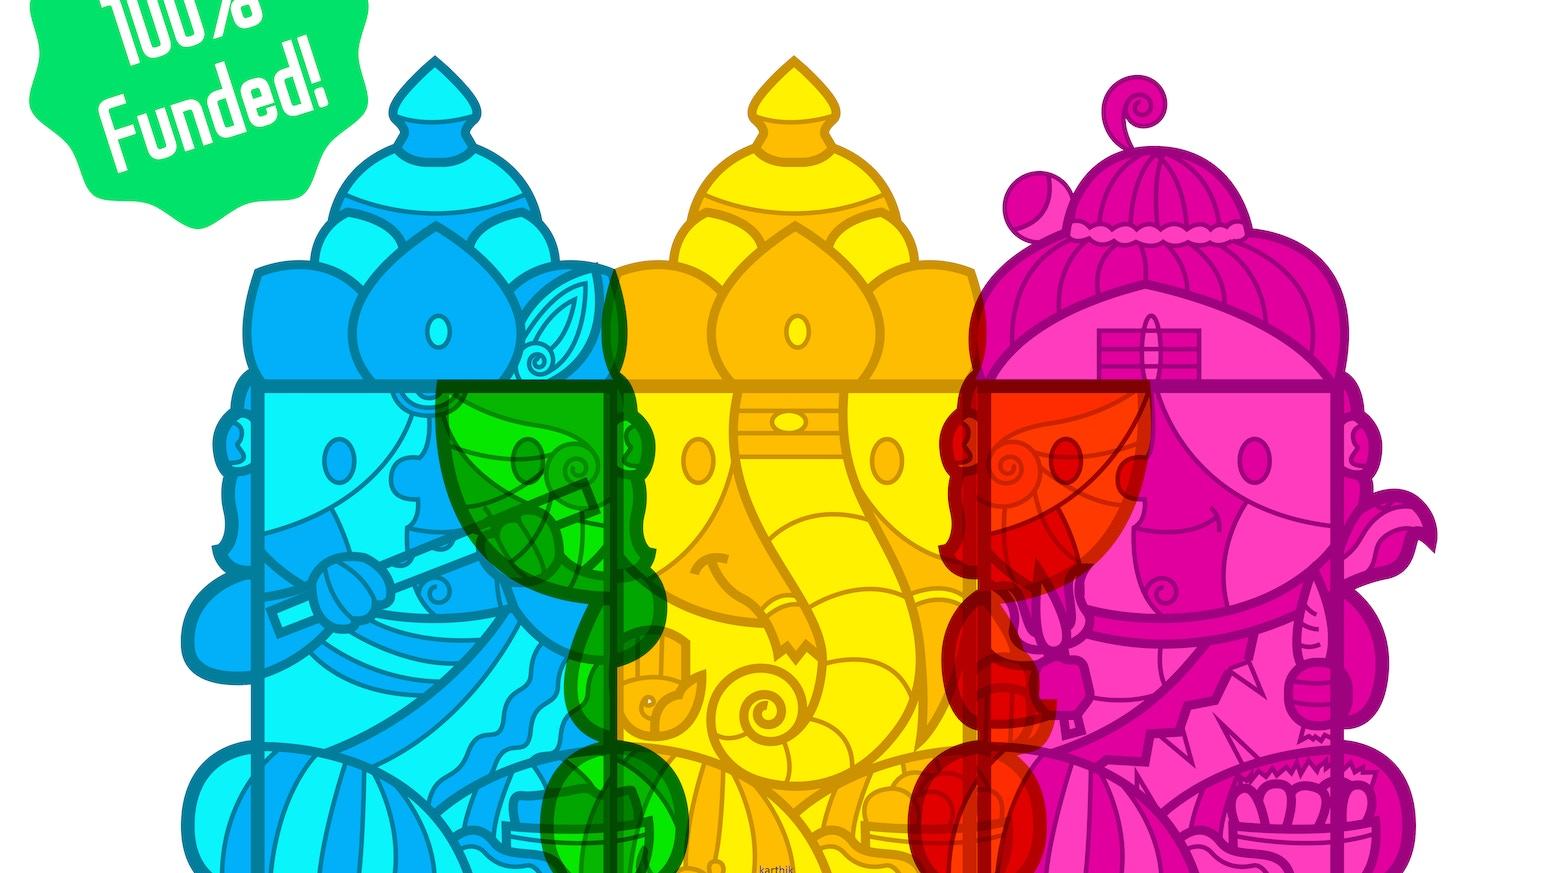 Celebrating the Indian festival of Golu with papercraft box dolls from Indian Mythology!